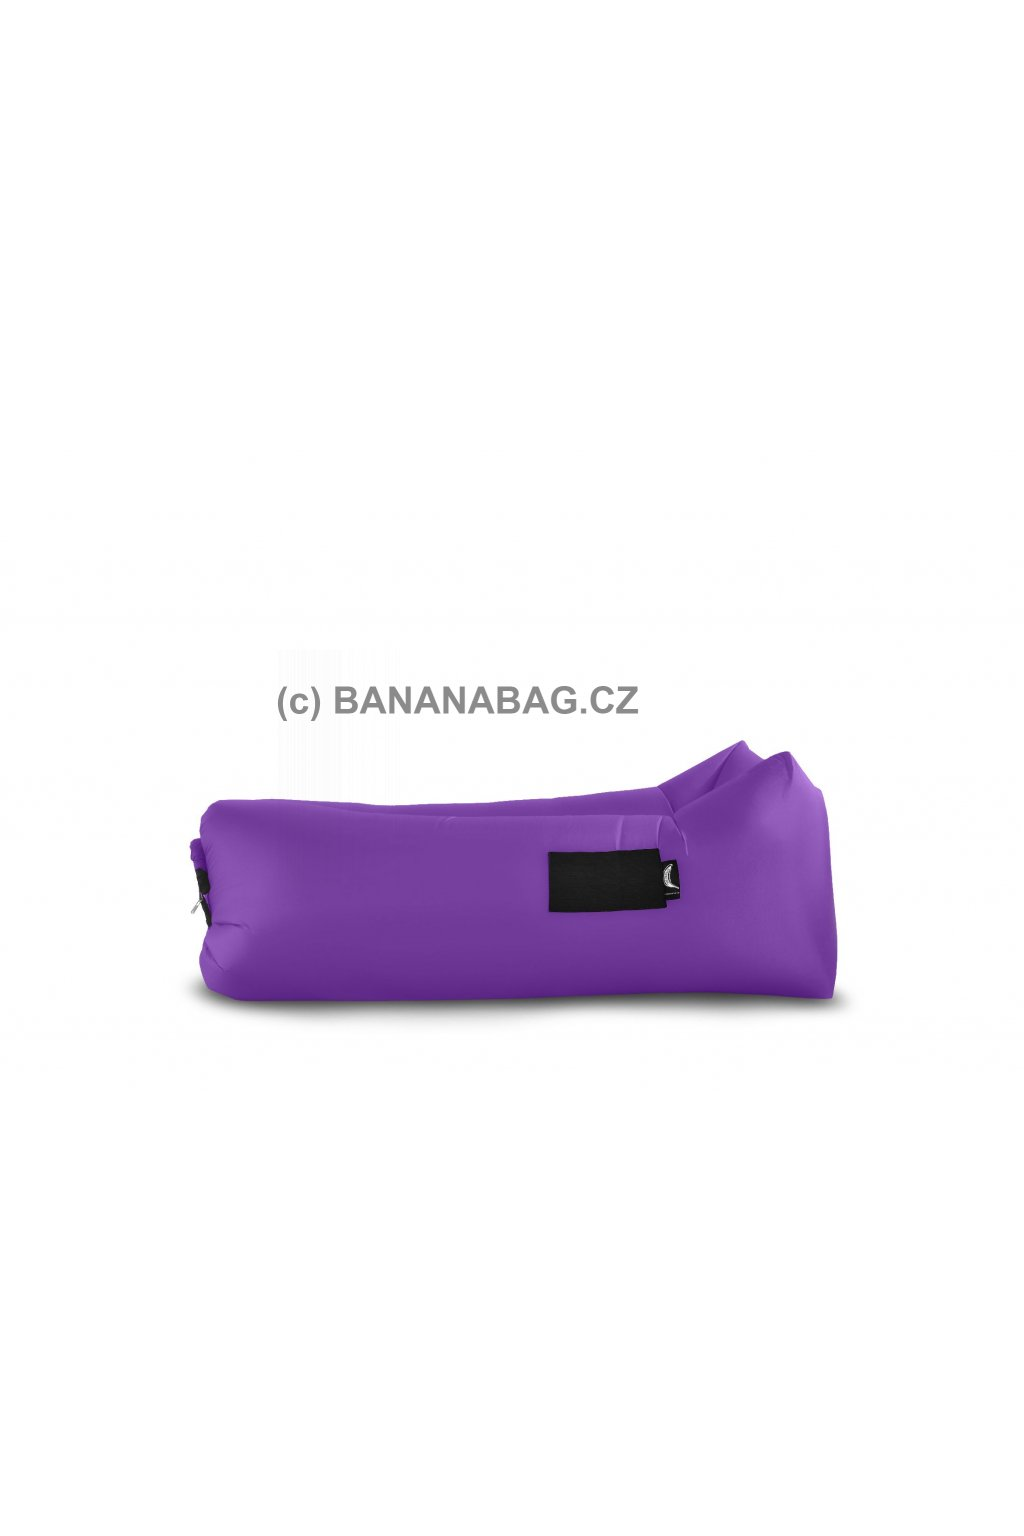 Lazy bag Bananabag fialový 02